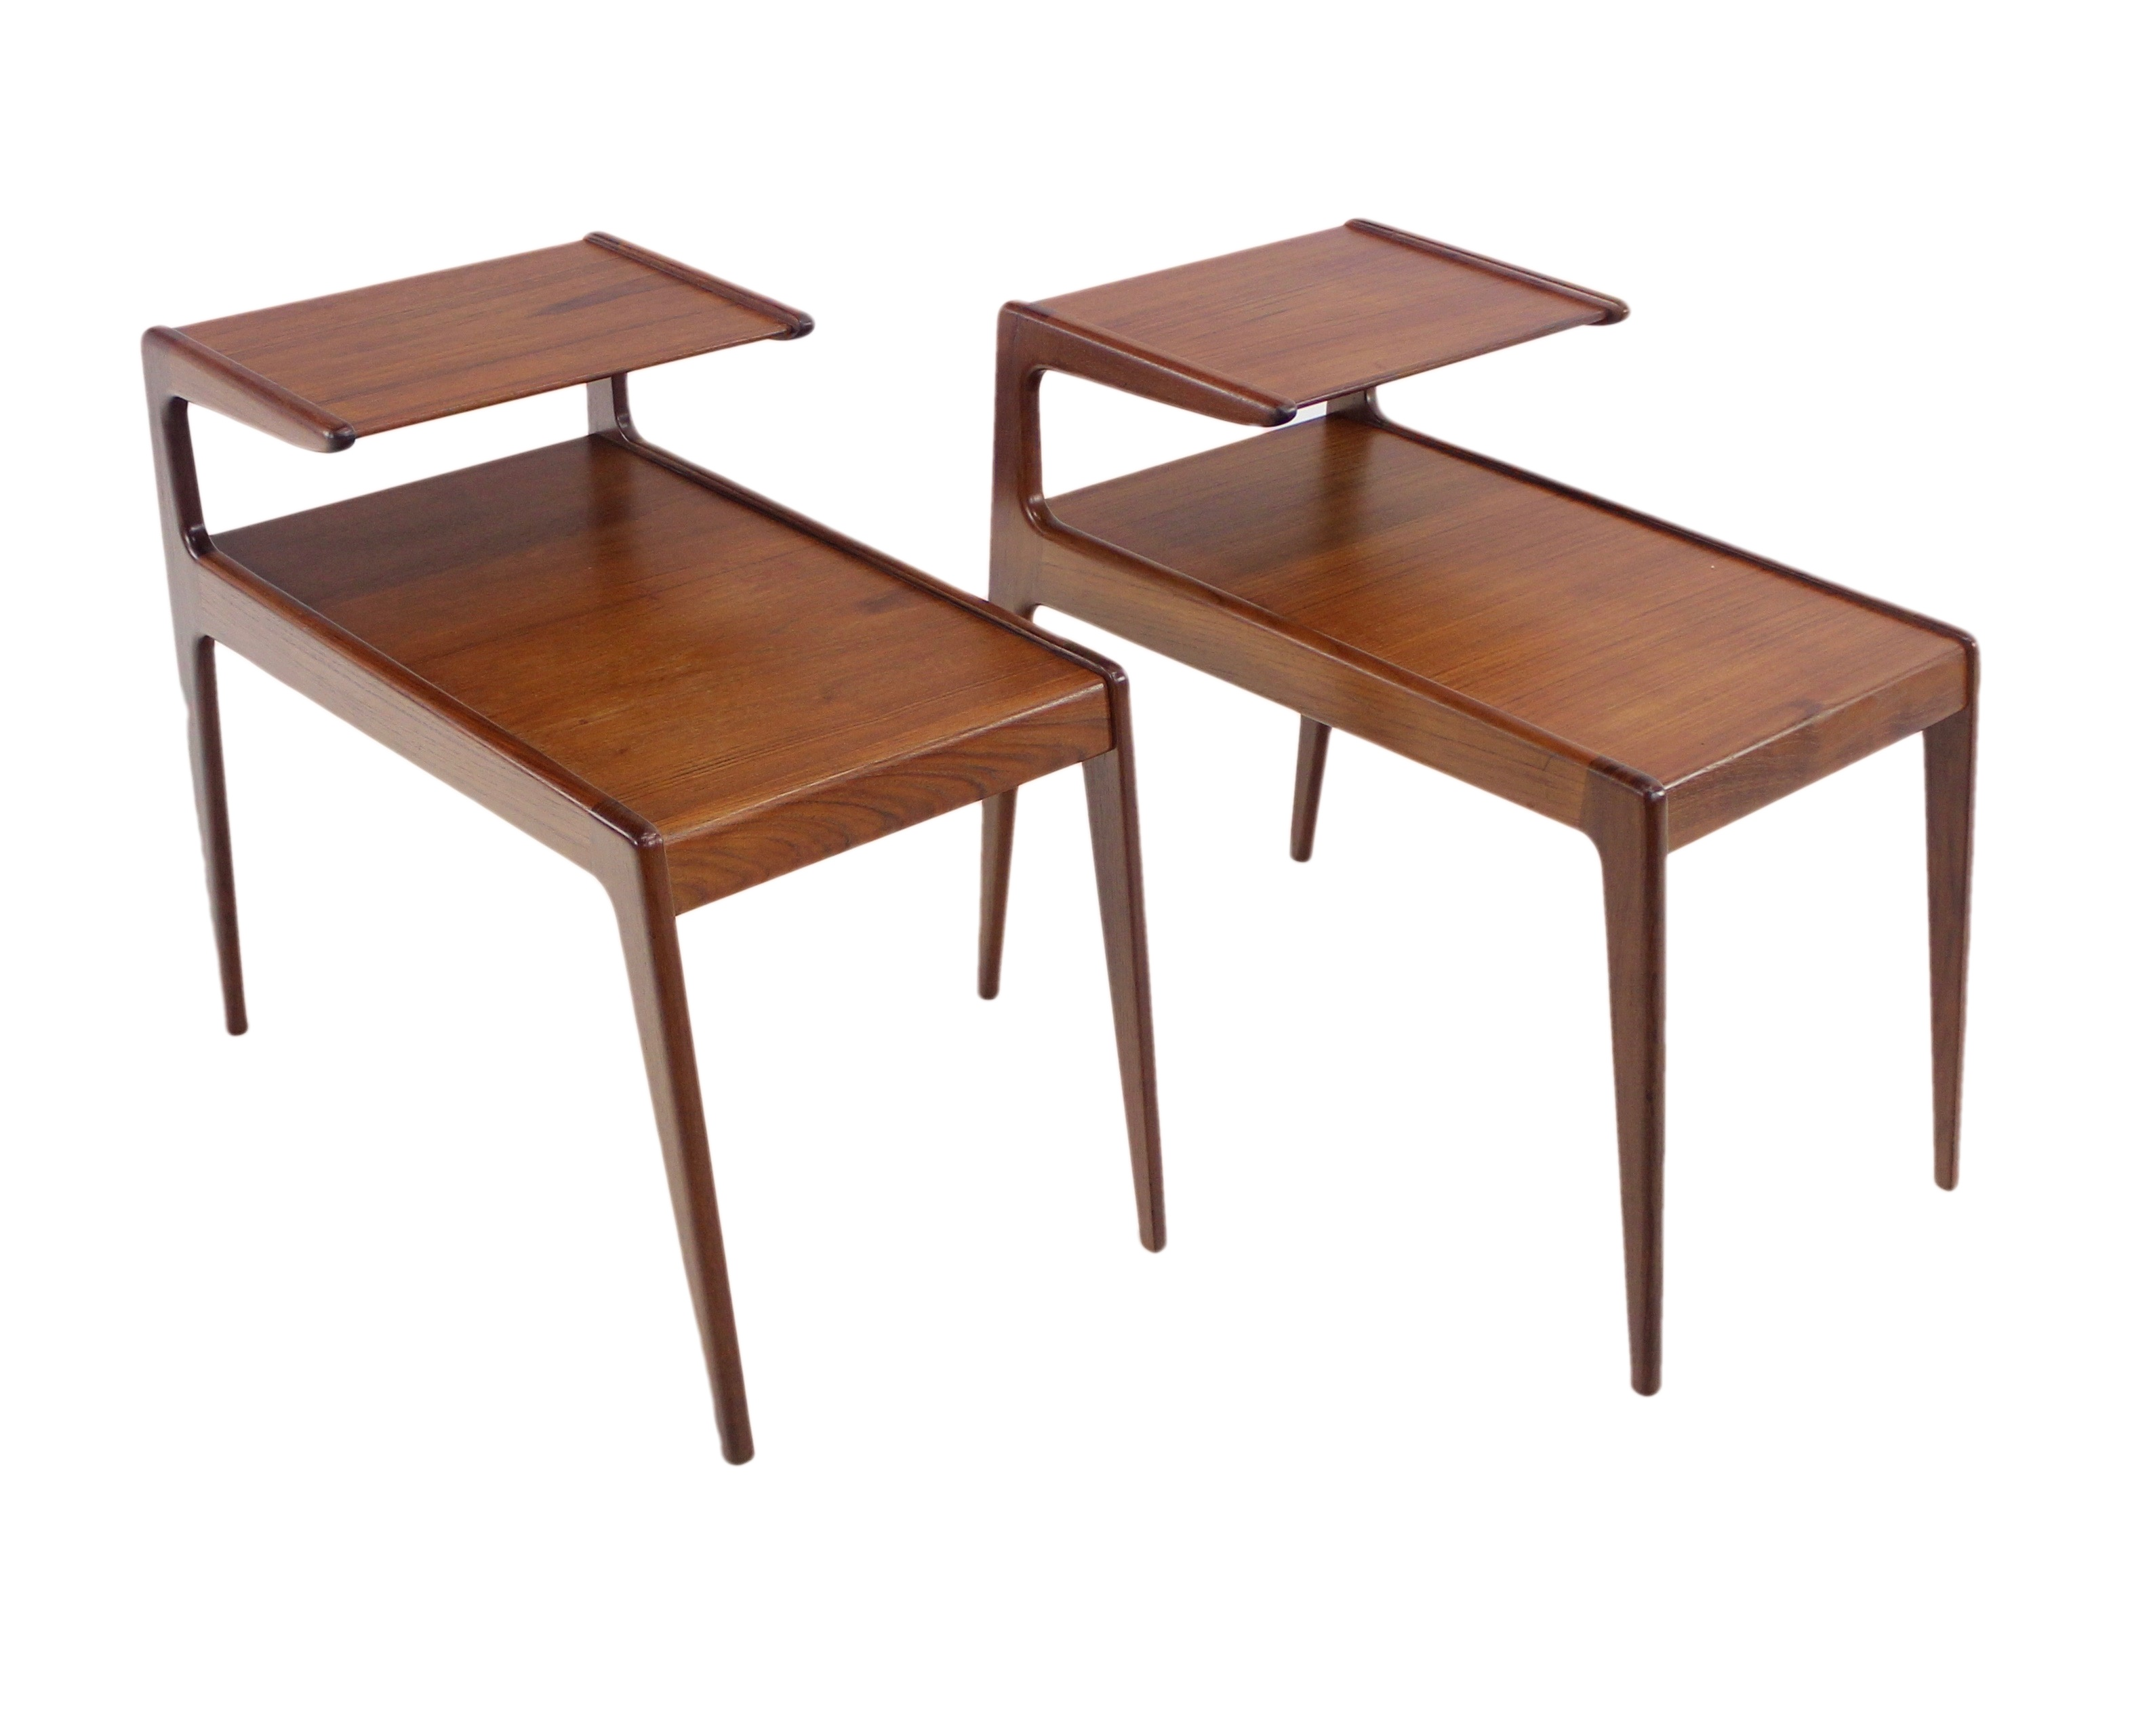 modern side tables. Pair Of Danish Modern Side Tables Designed By Kurt Ostervig